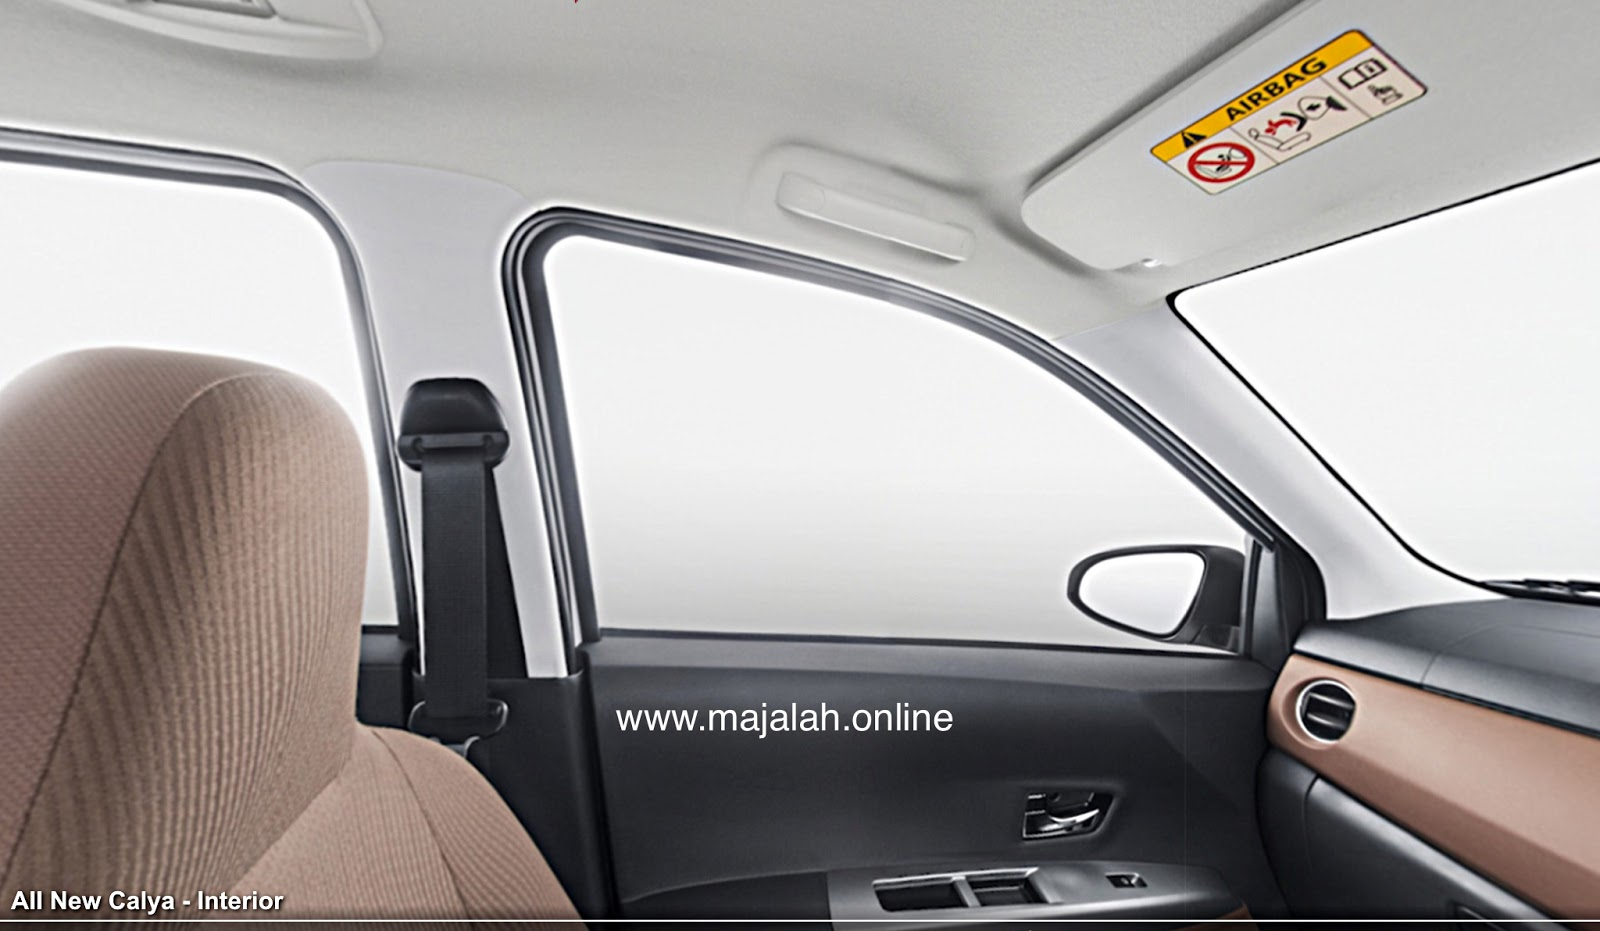 Konsumsi Bensin All New Kijang Innova Kelebihan Grand Veloz 1.5 Mirip Adik Kakak Dengan Innova, Toyota Calya Melepas ...